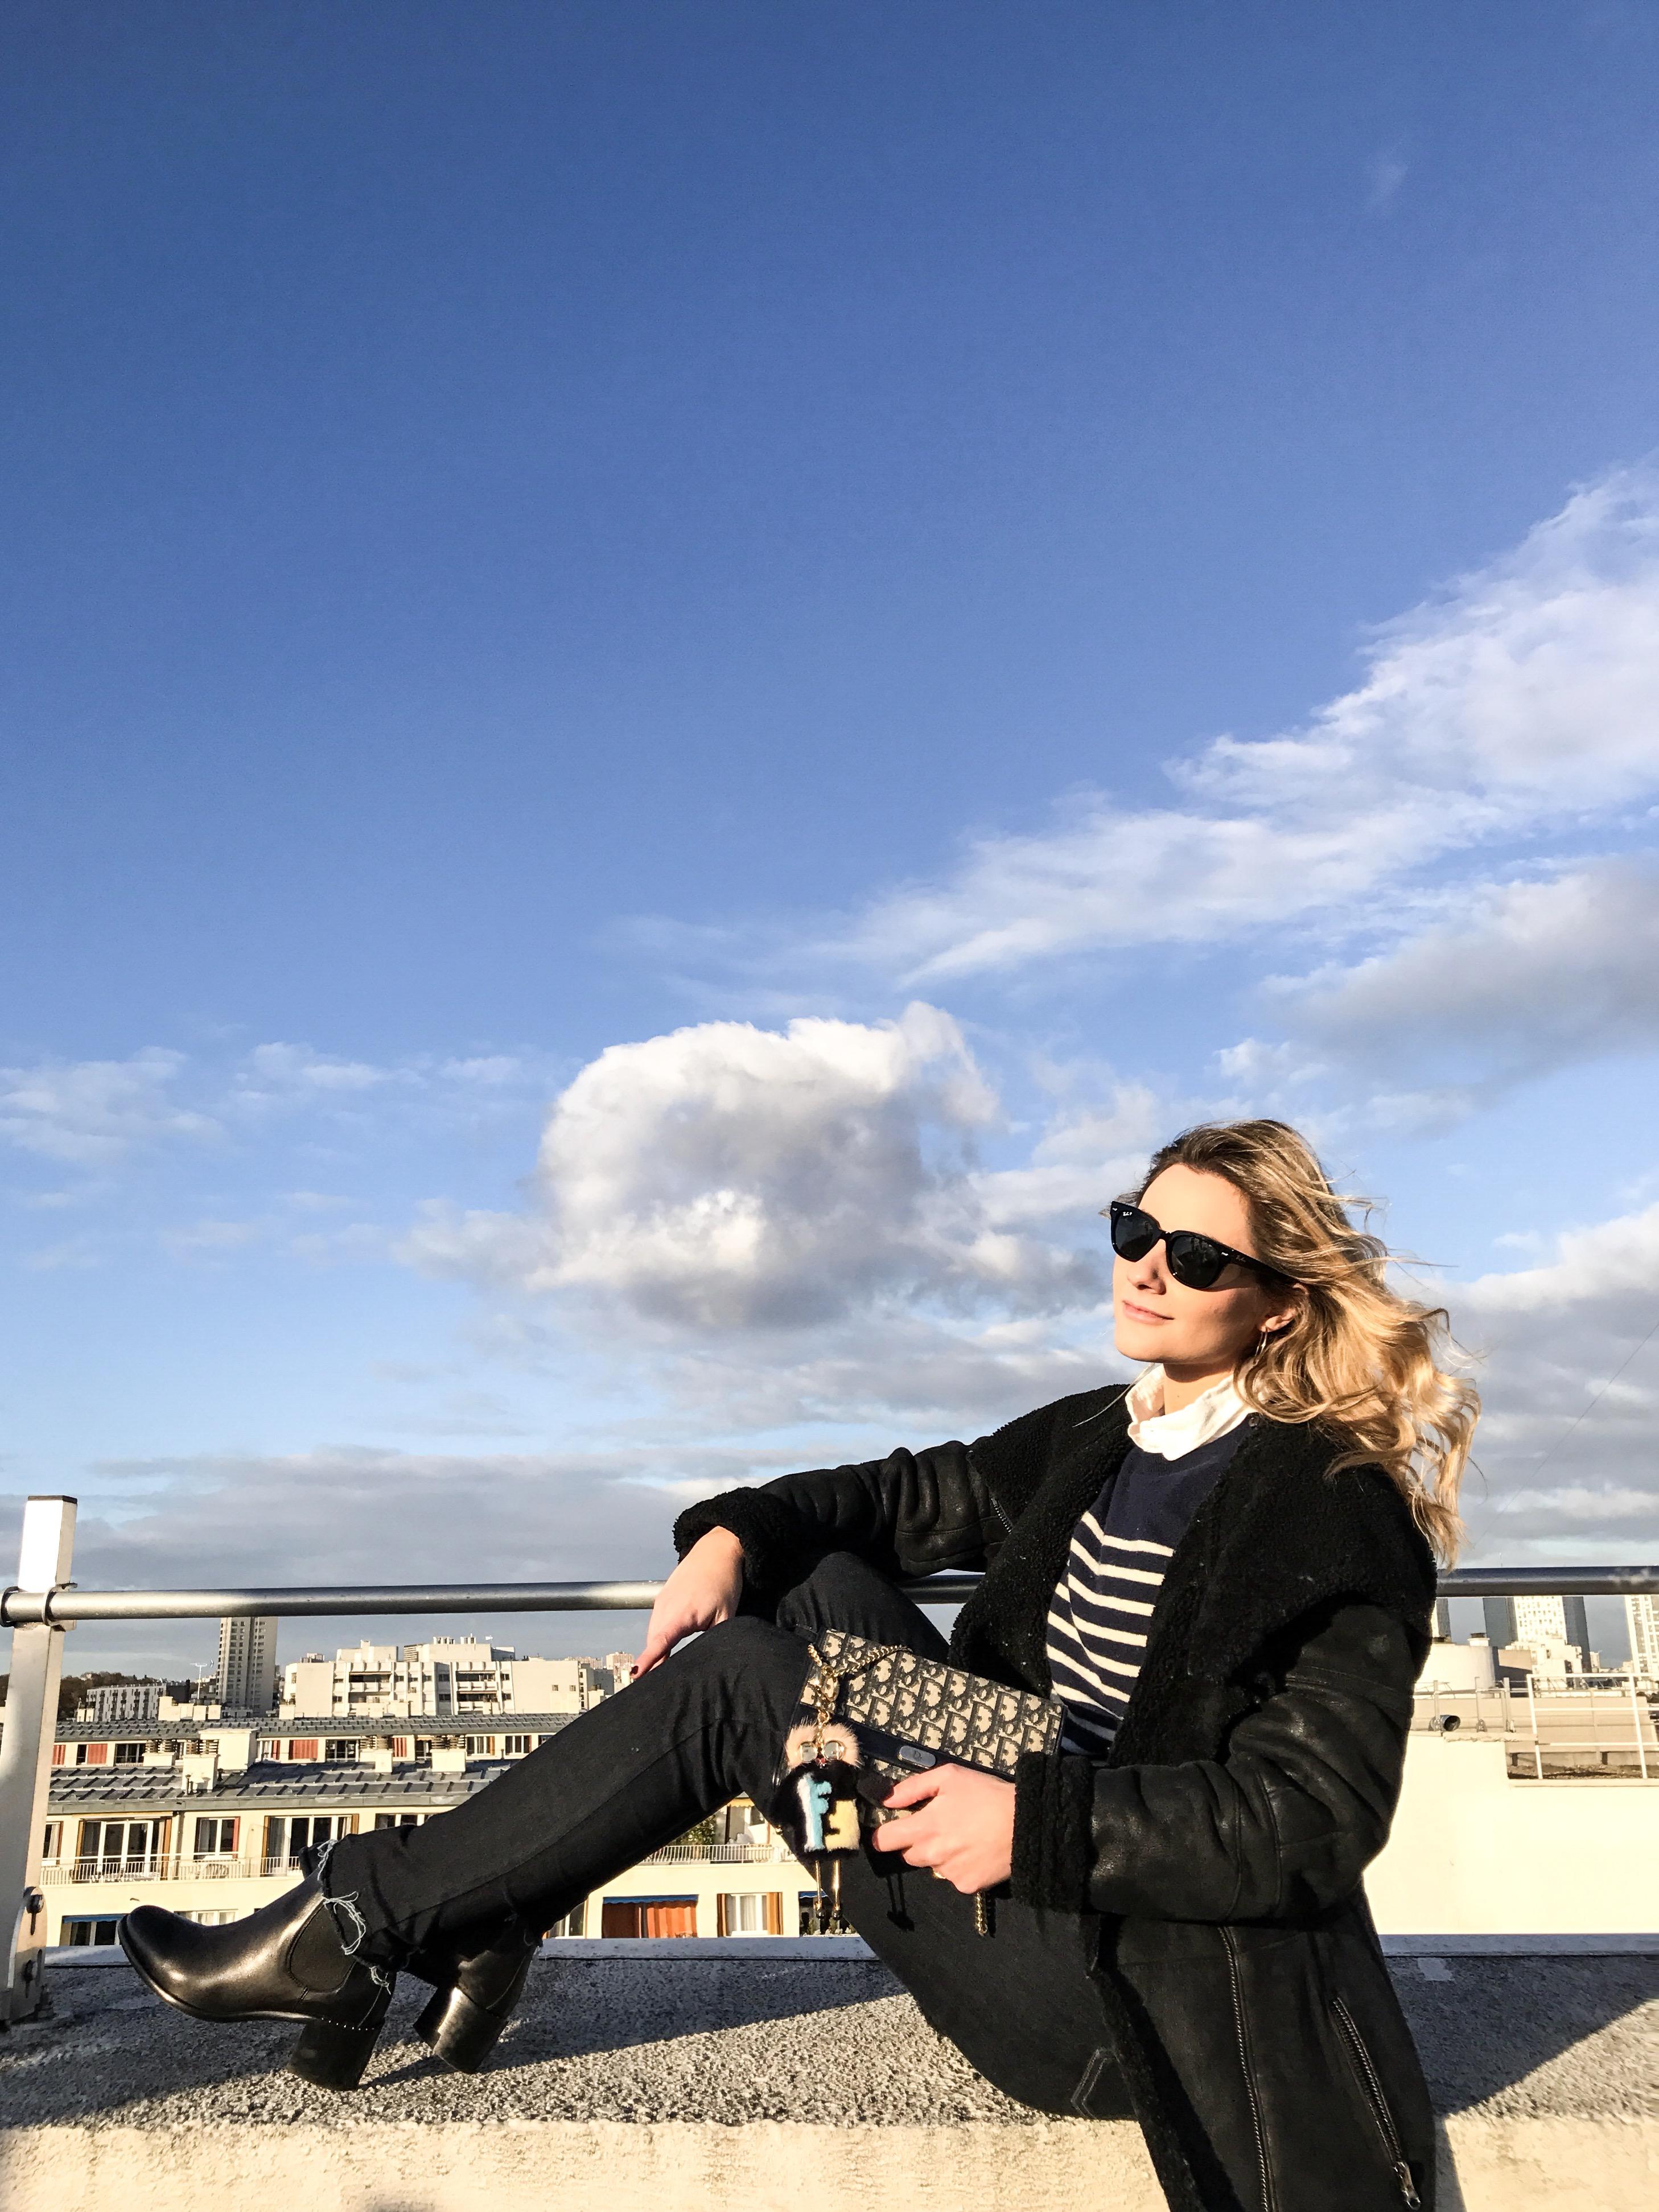 Dior vinatge, blog mode, camille benaroche, blog beauté, lifestyle, travels, mode, streetstyle, blog mode paris